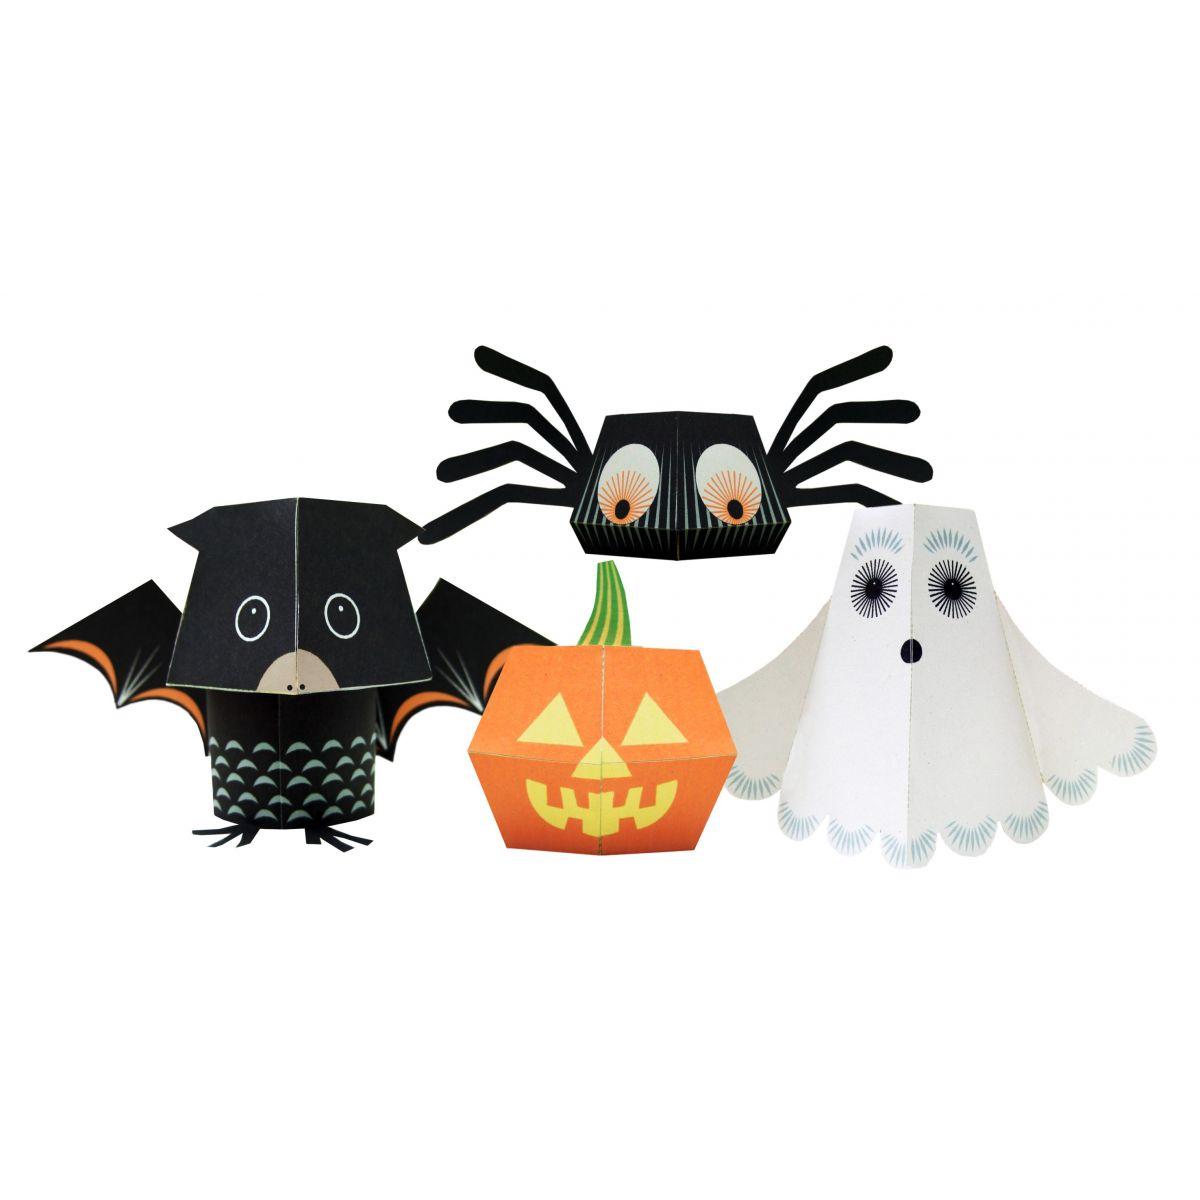 paper toys team halloween set de bricolage 4 animaux sebio. Black Bedroom Furniture Sets. Home Design Ideas